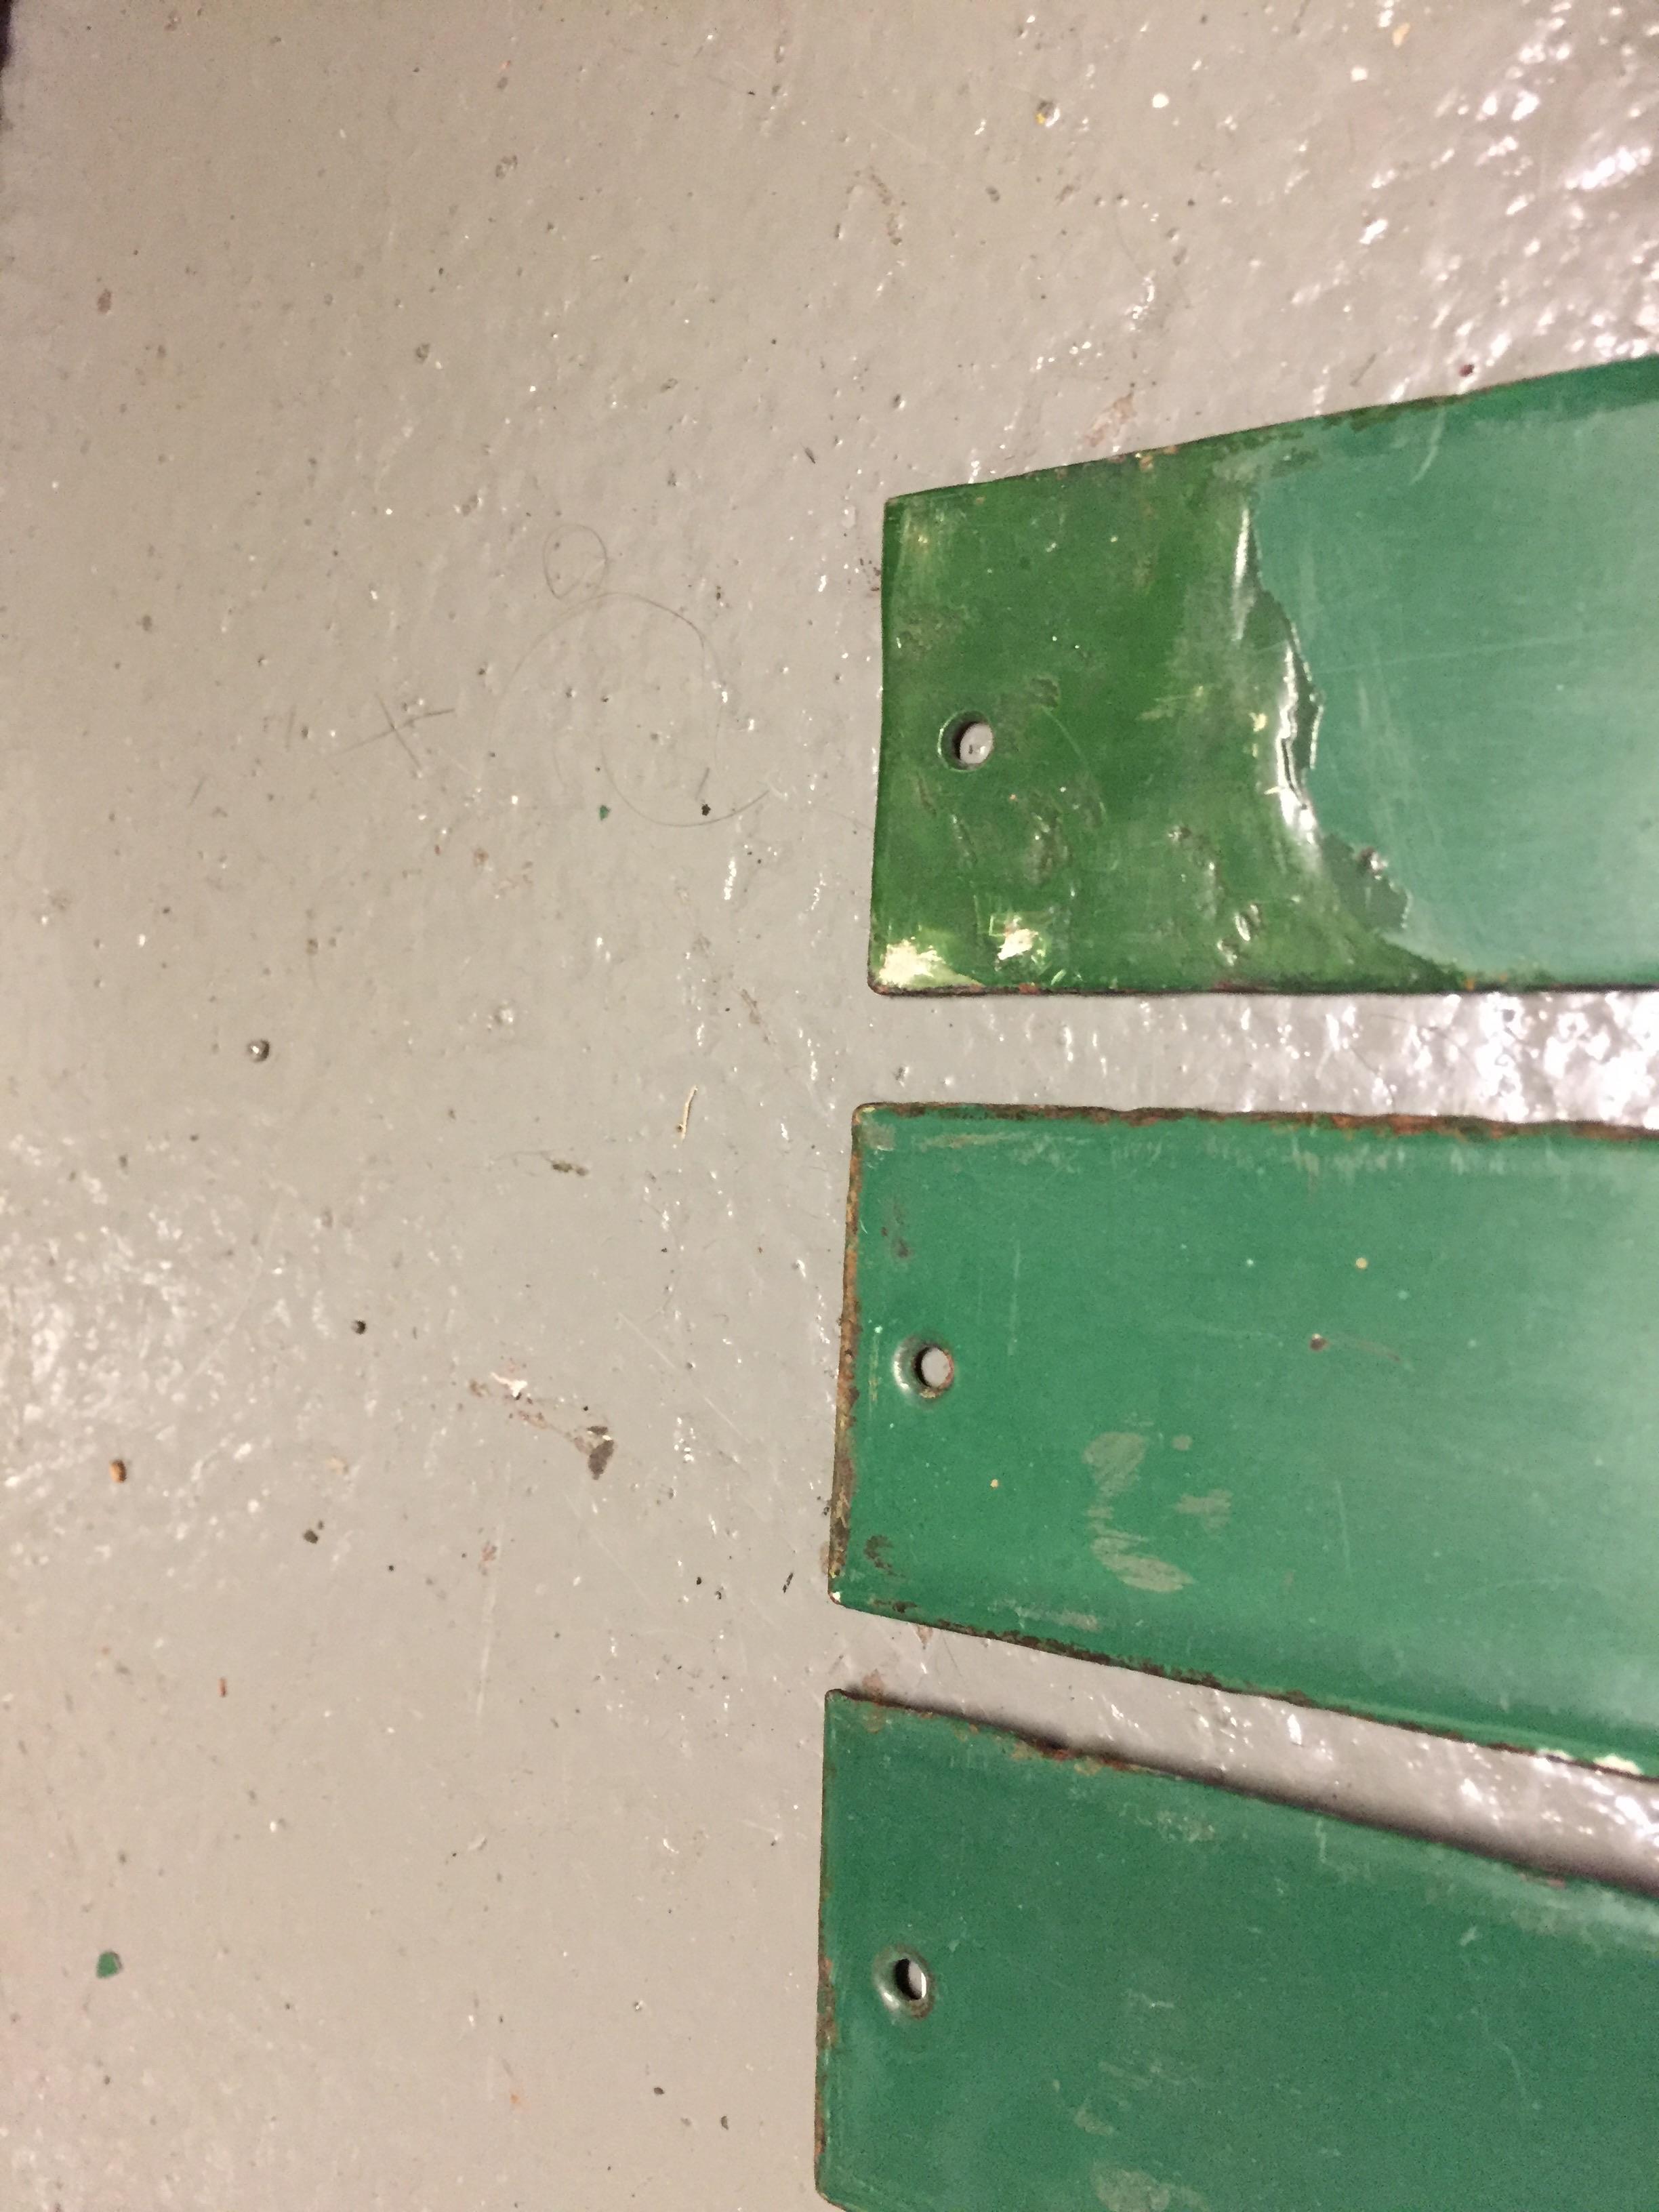 Four London Underground enamel destination plates for the District line, - Image 4 of 4